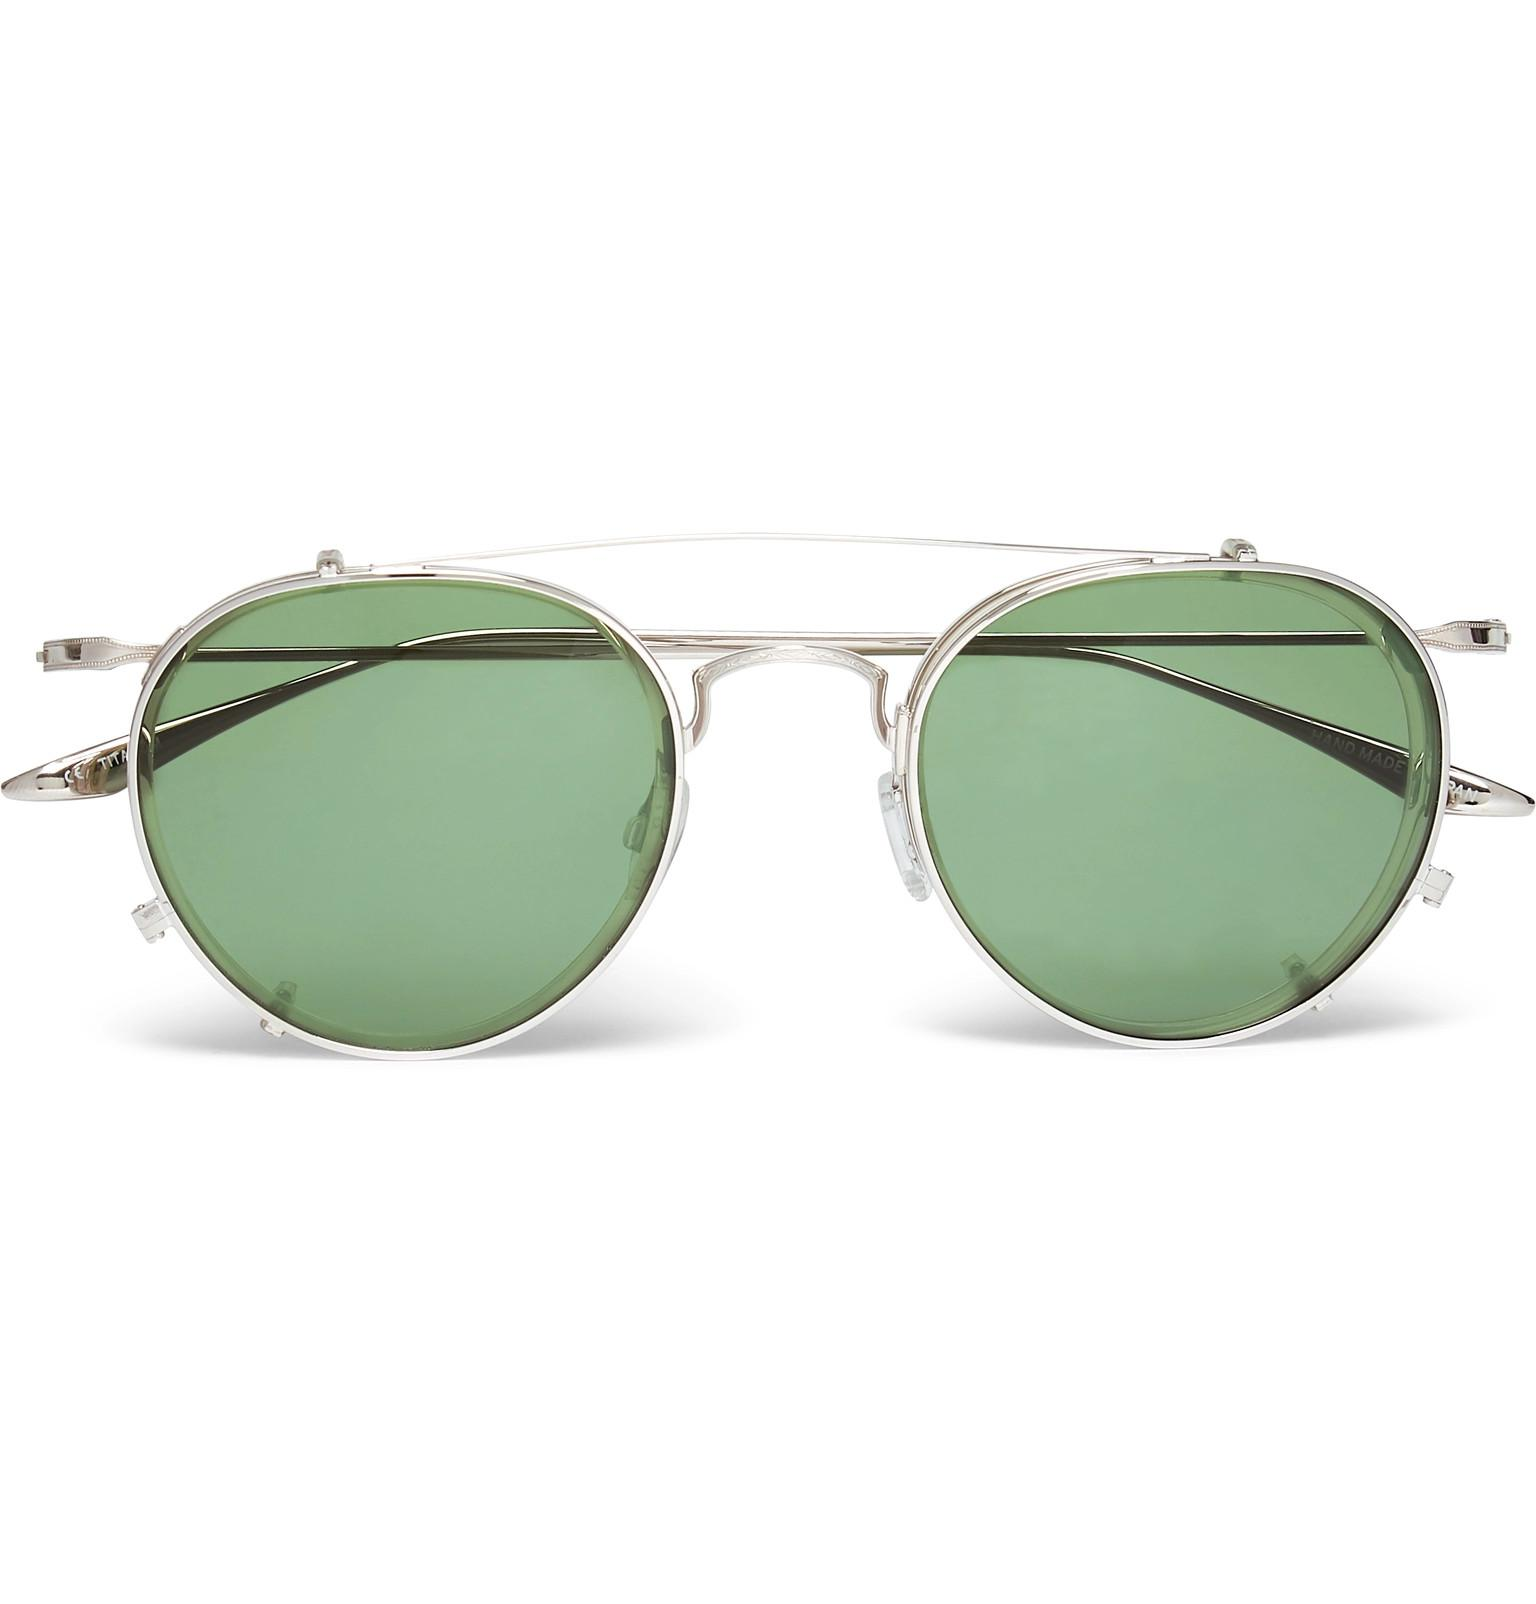 a7e1b0366d Barton Perreira. Men s Metallic Aalto Round-frame Titanium And Acetate  Optical Glasses With Clip-on Aviator-style ...